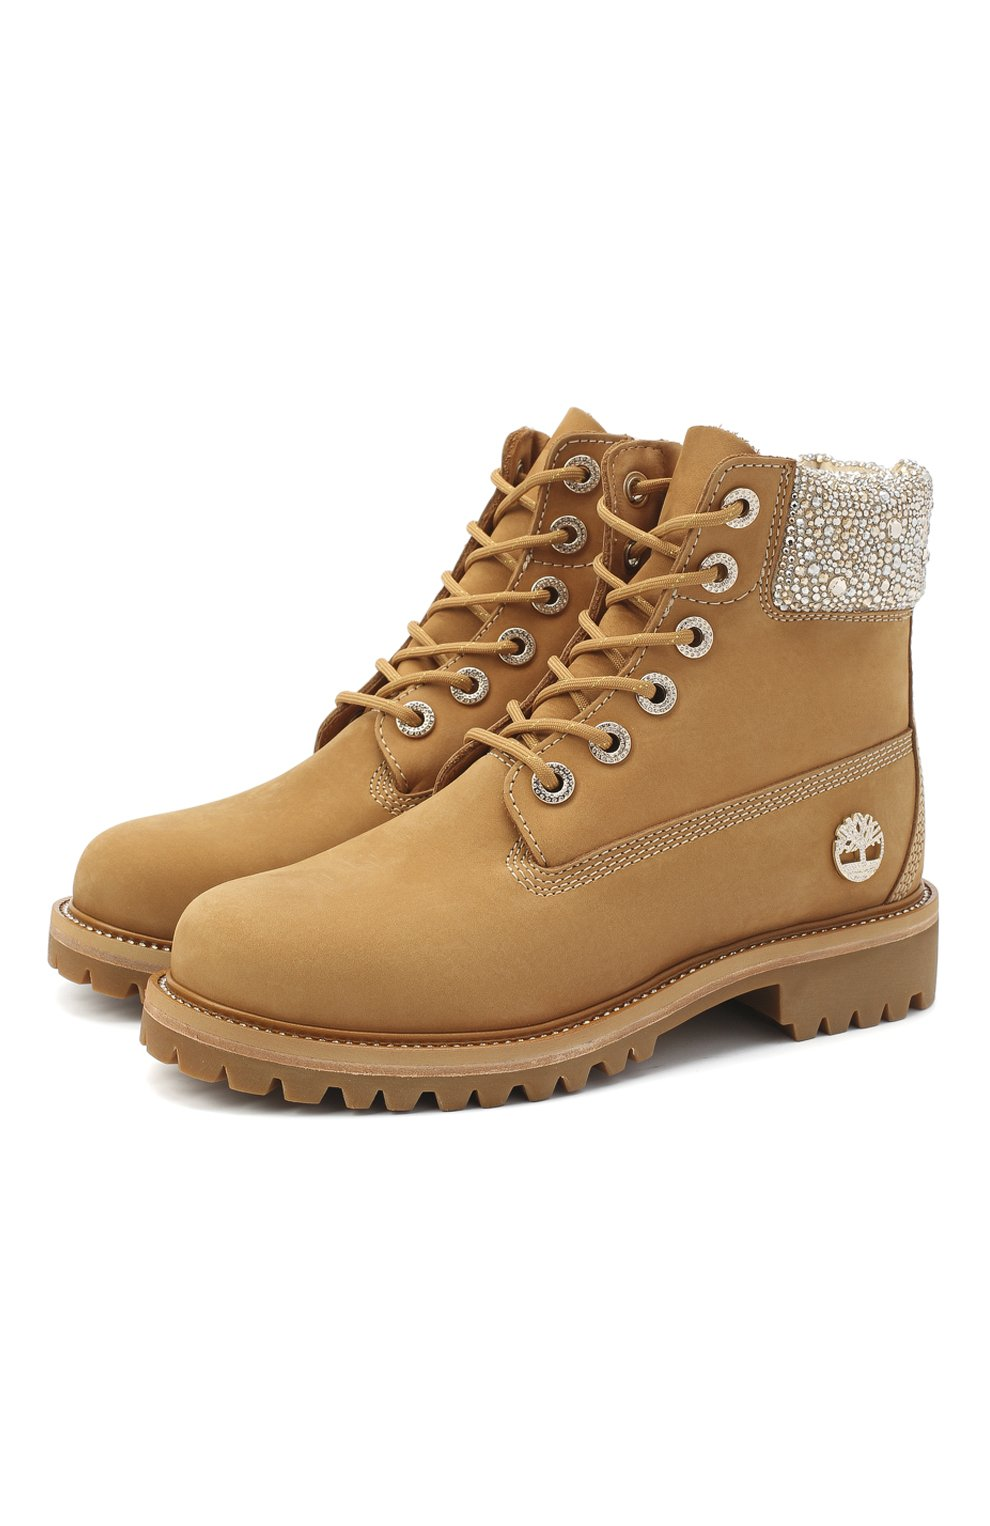 Женские кожаные ботинки jc x timberland JIMMY CHOO бежевого цвета, арт. JC X TIMBERLAND/F/TNCL | Фото 1